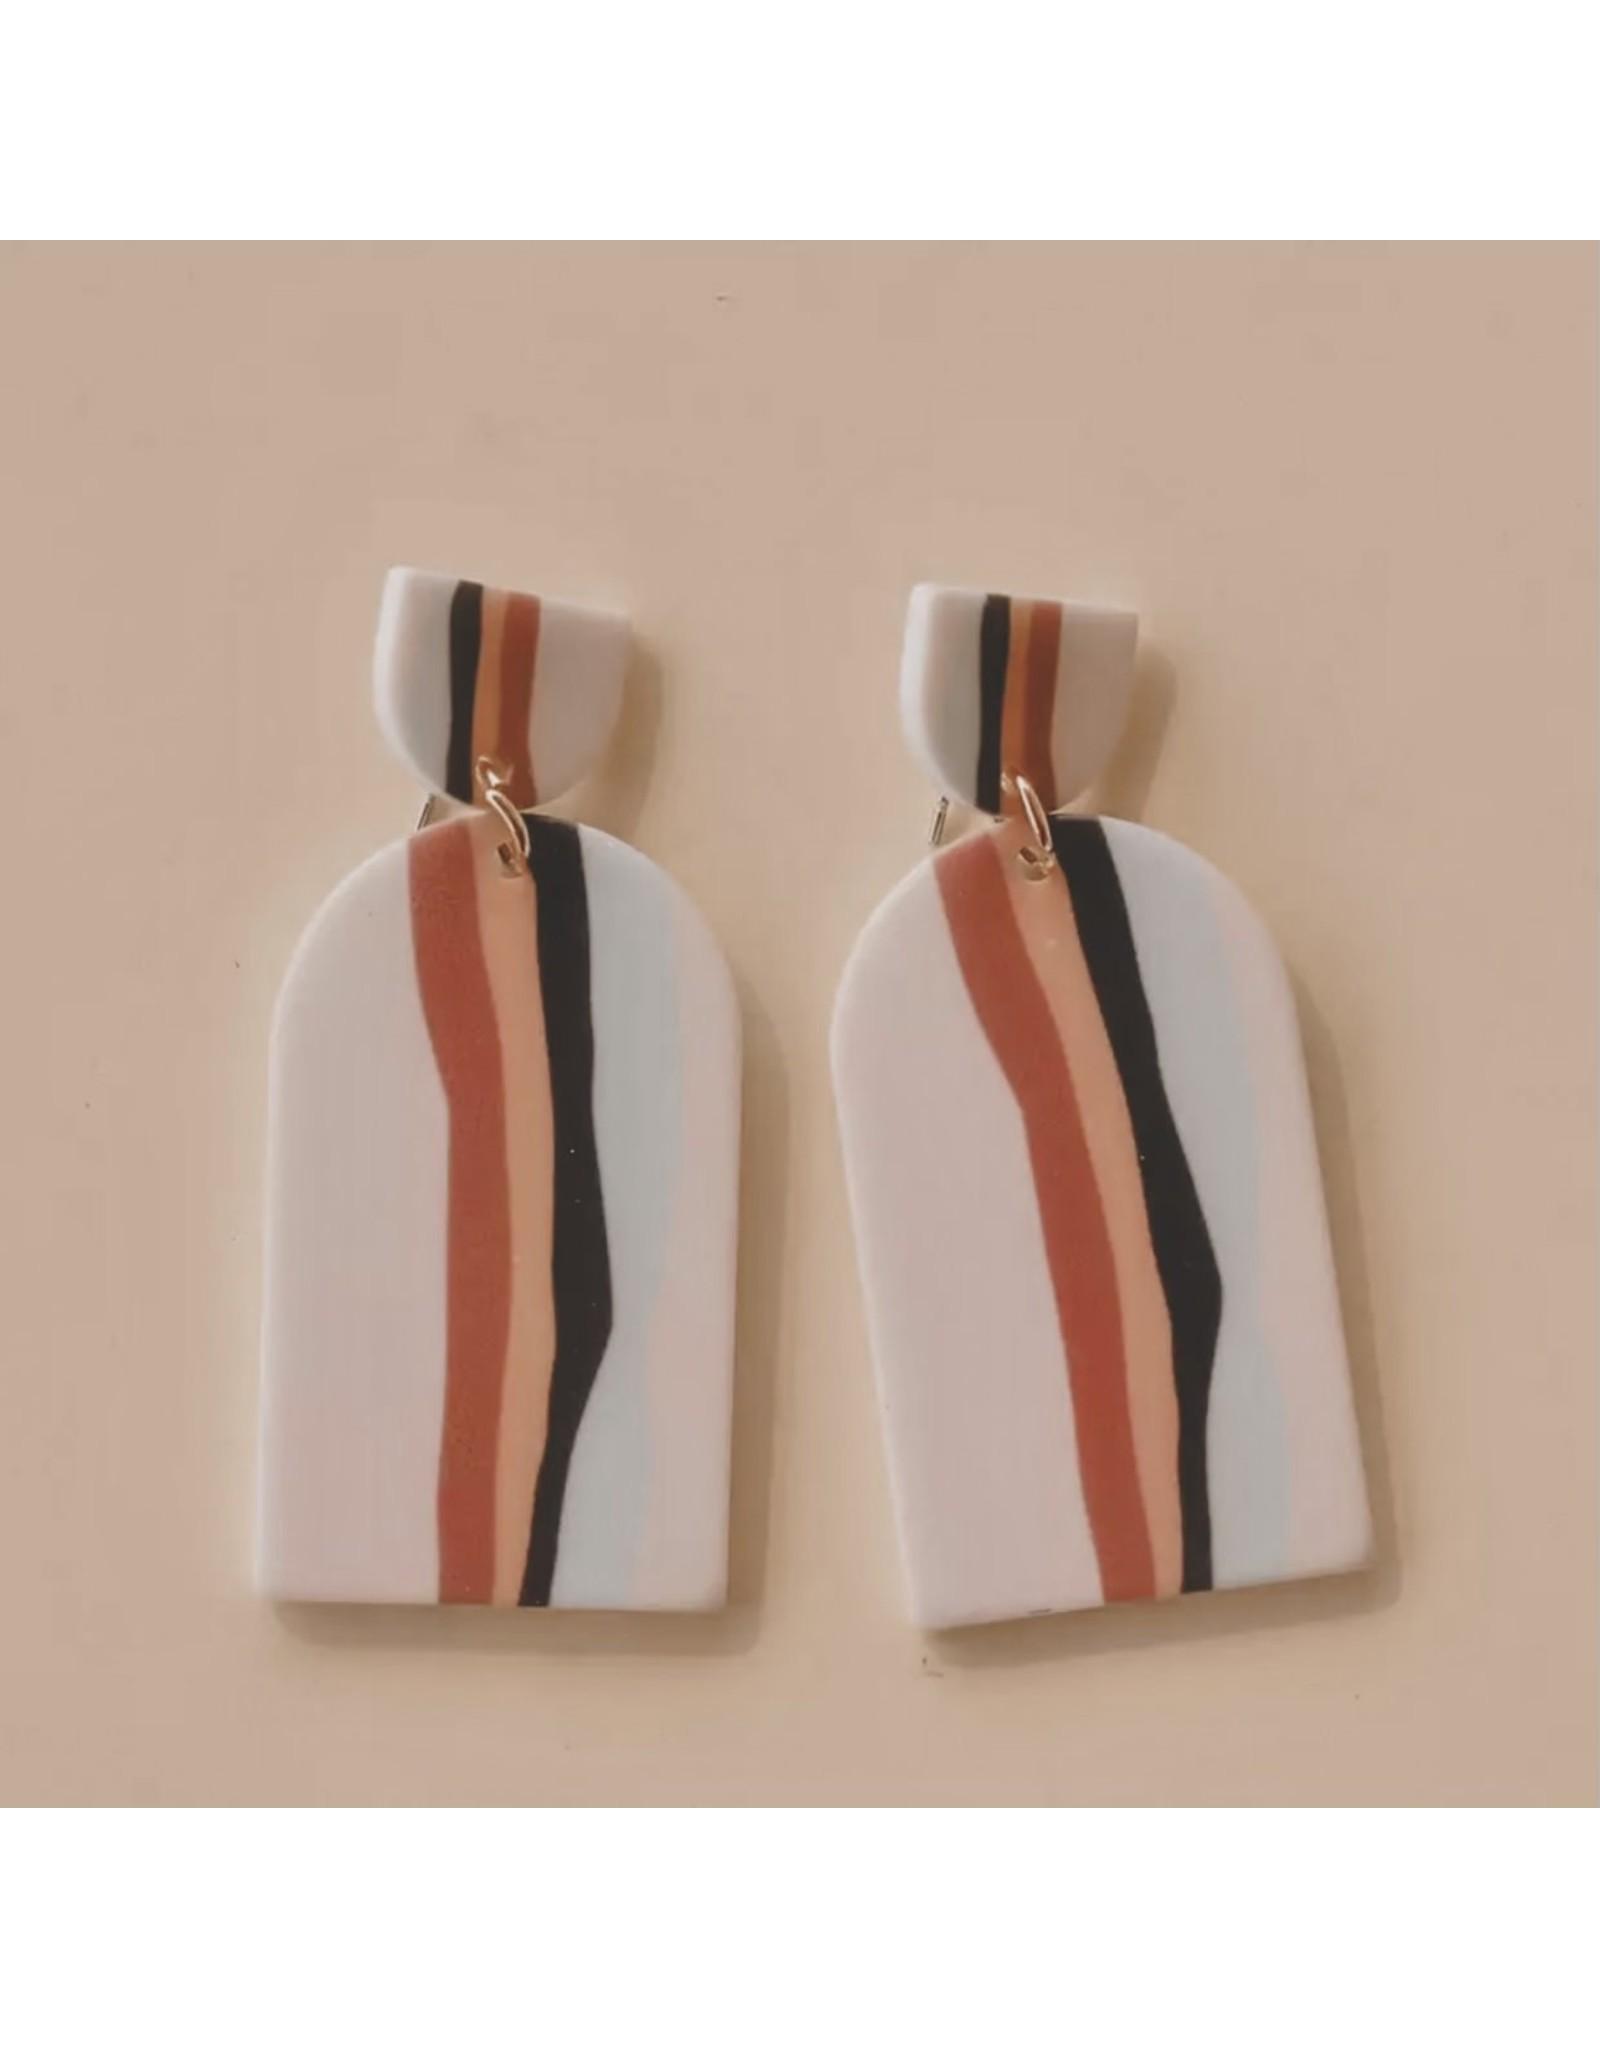 MCKENNA Blush Clay Earrings